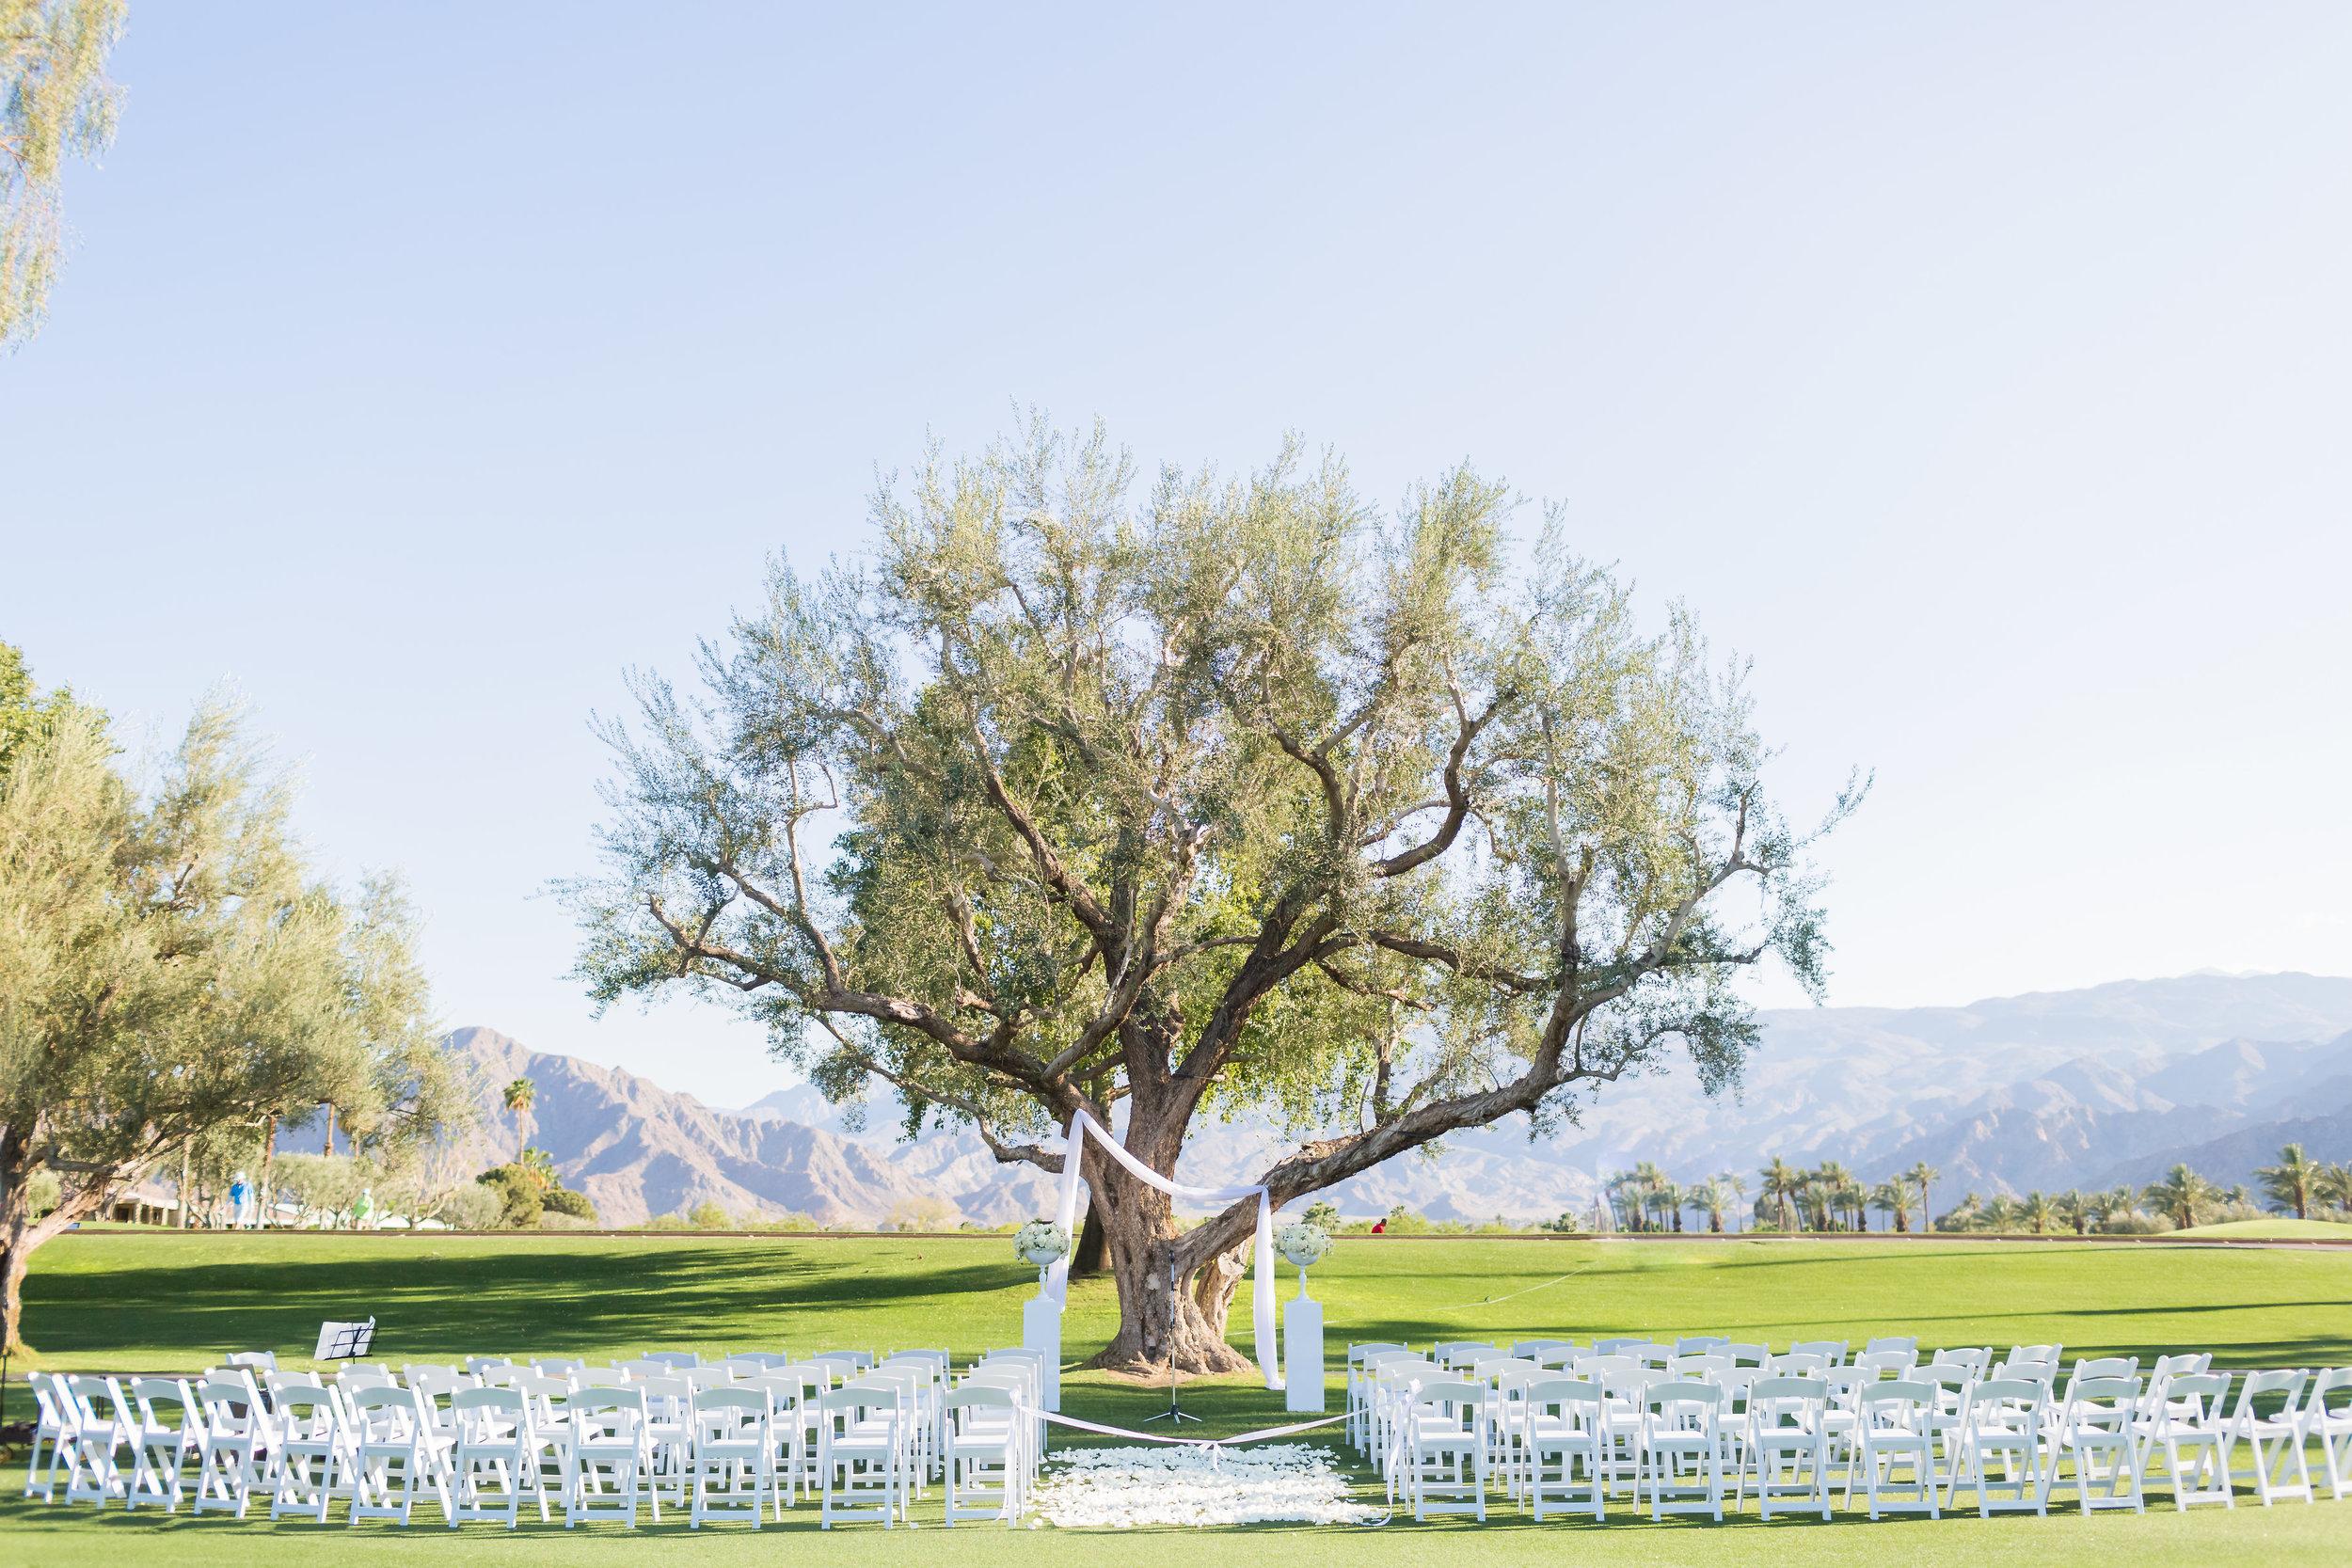 Courtney.Chris.Wedding.La.Quinta.Monocle.Project.344.jpg